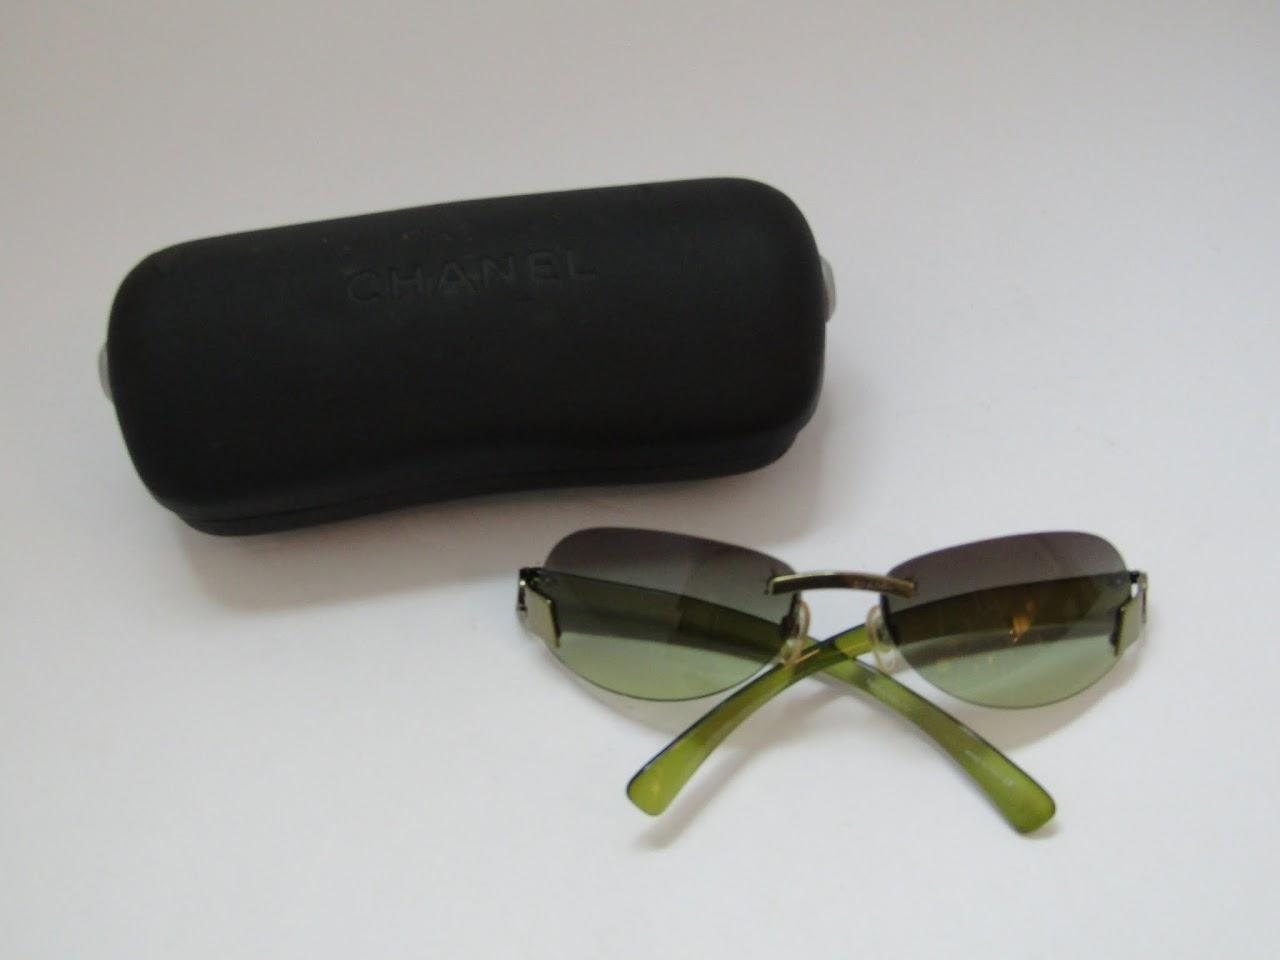 Chanel Green Tint Sunglasses